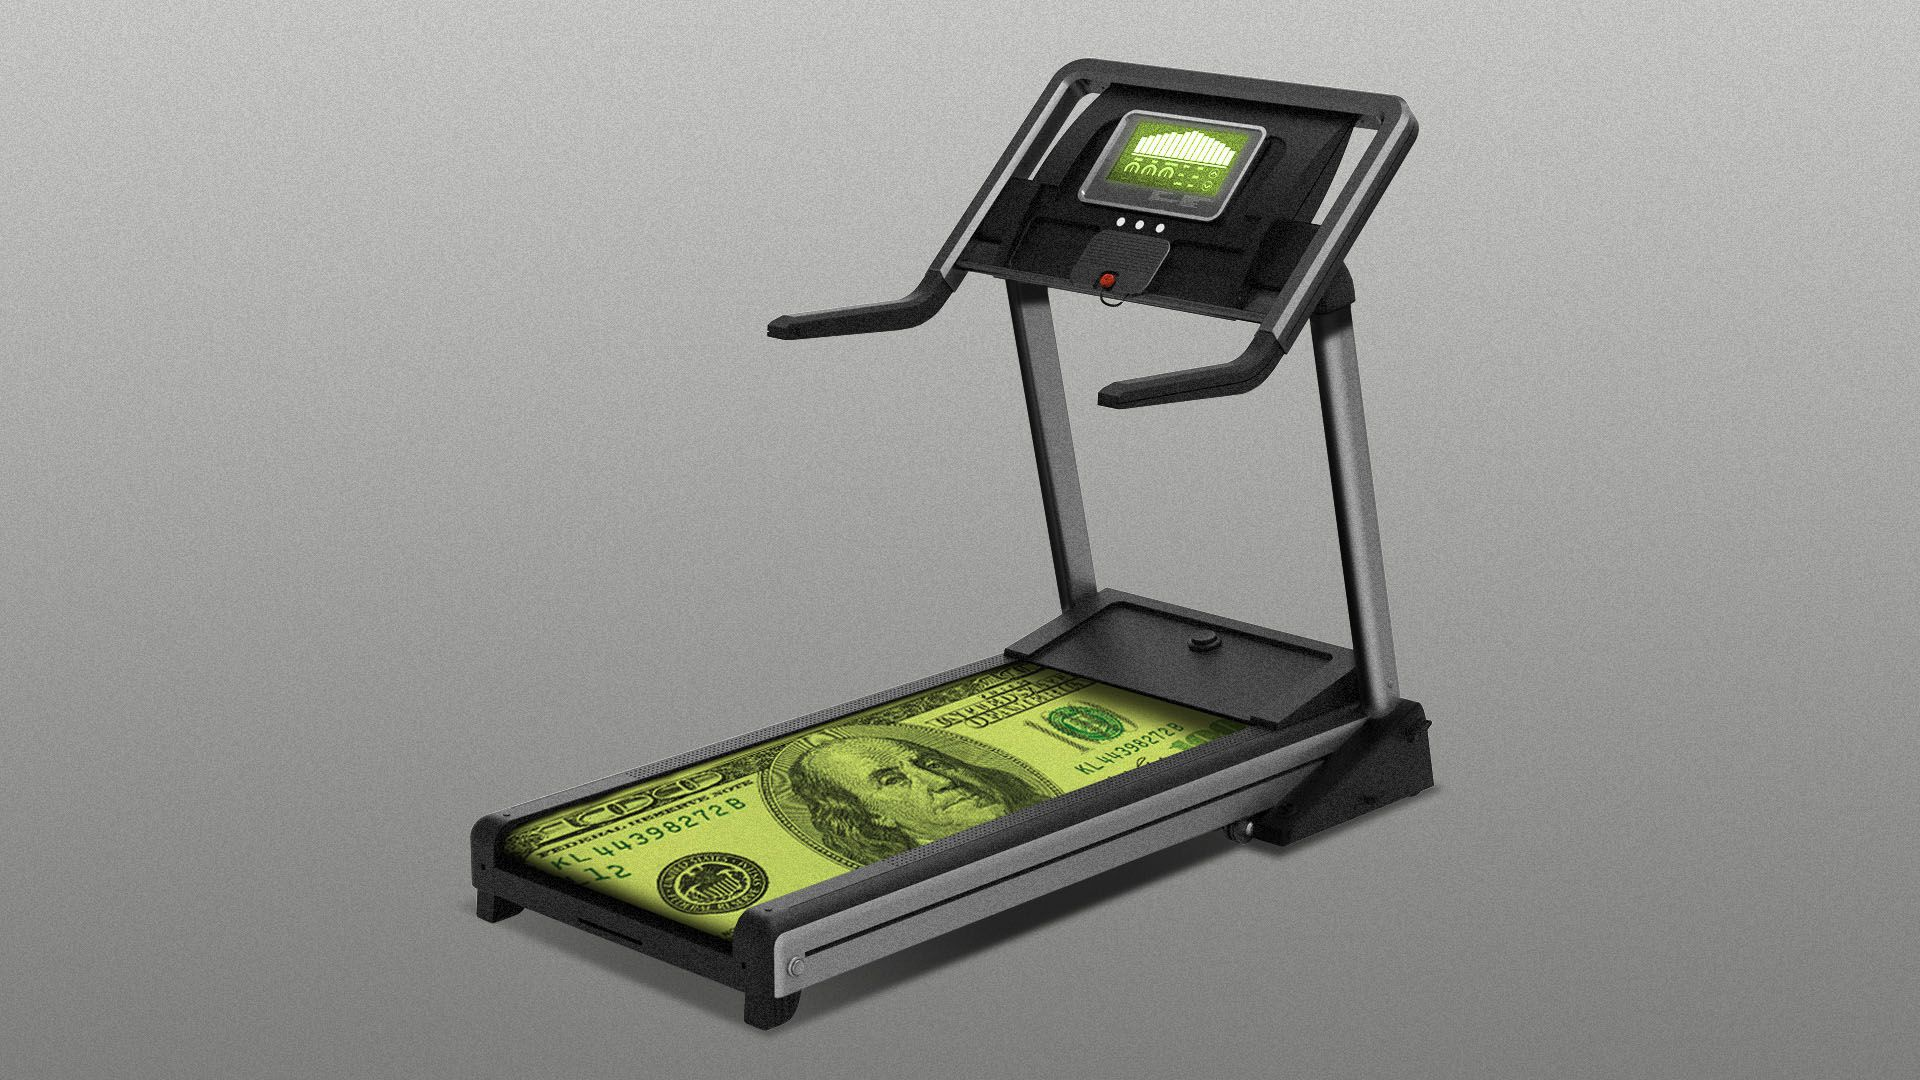 Illustration of a treadmill with a hundred dollar bill for a running belt